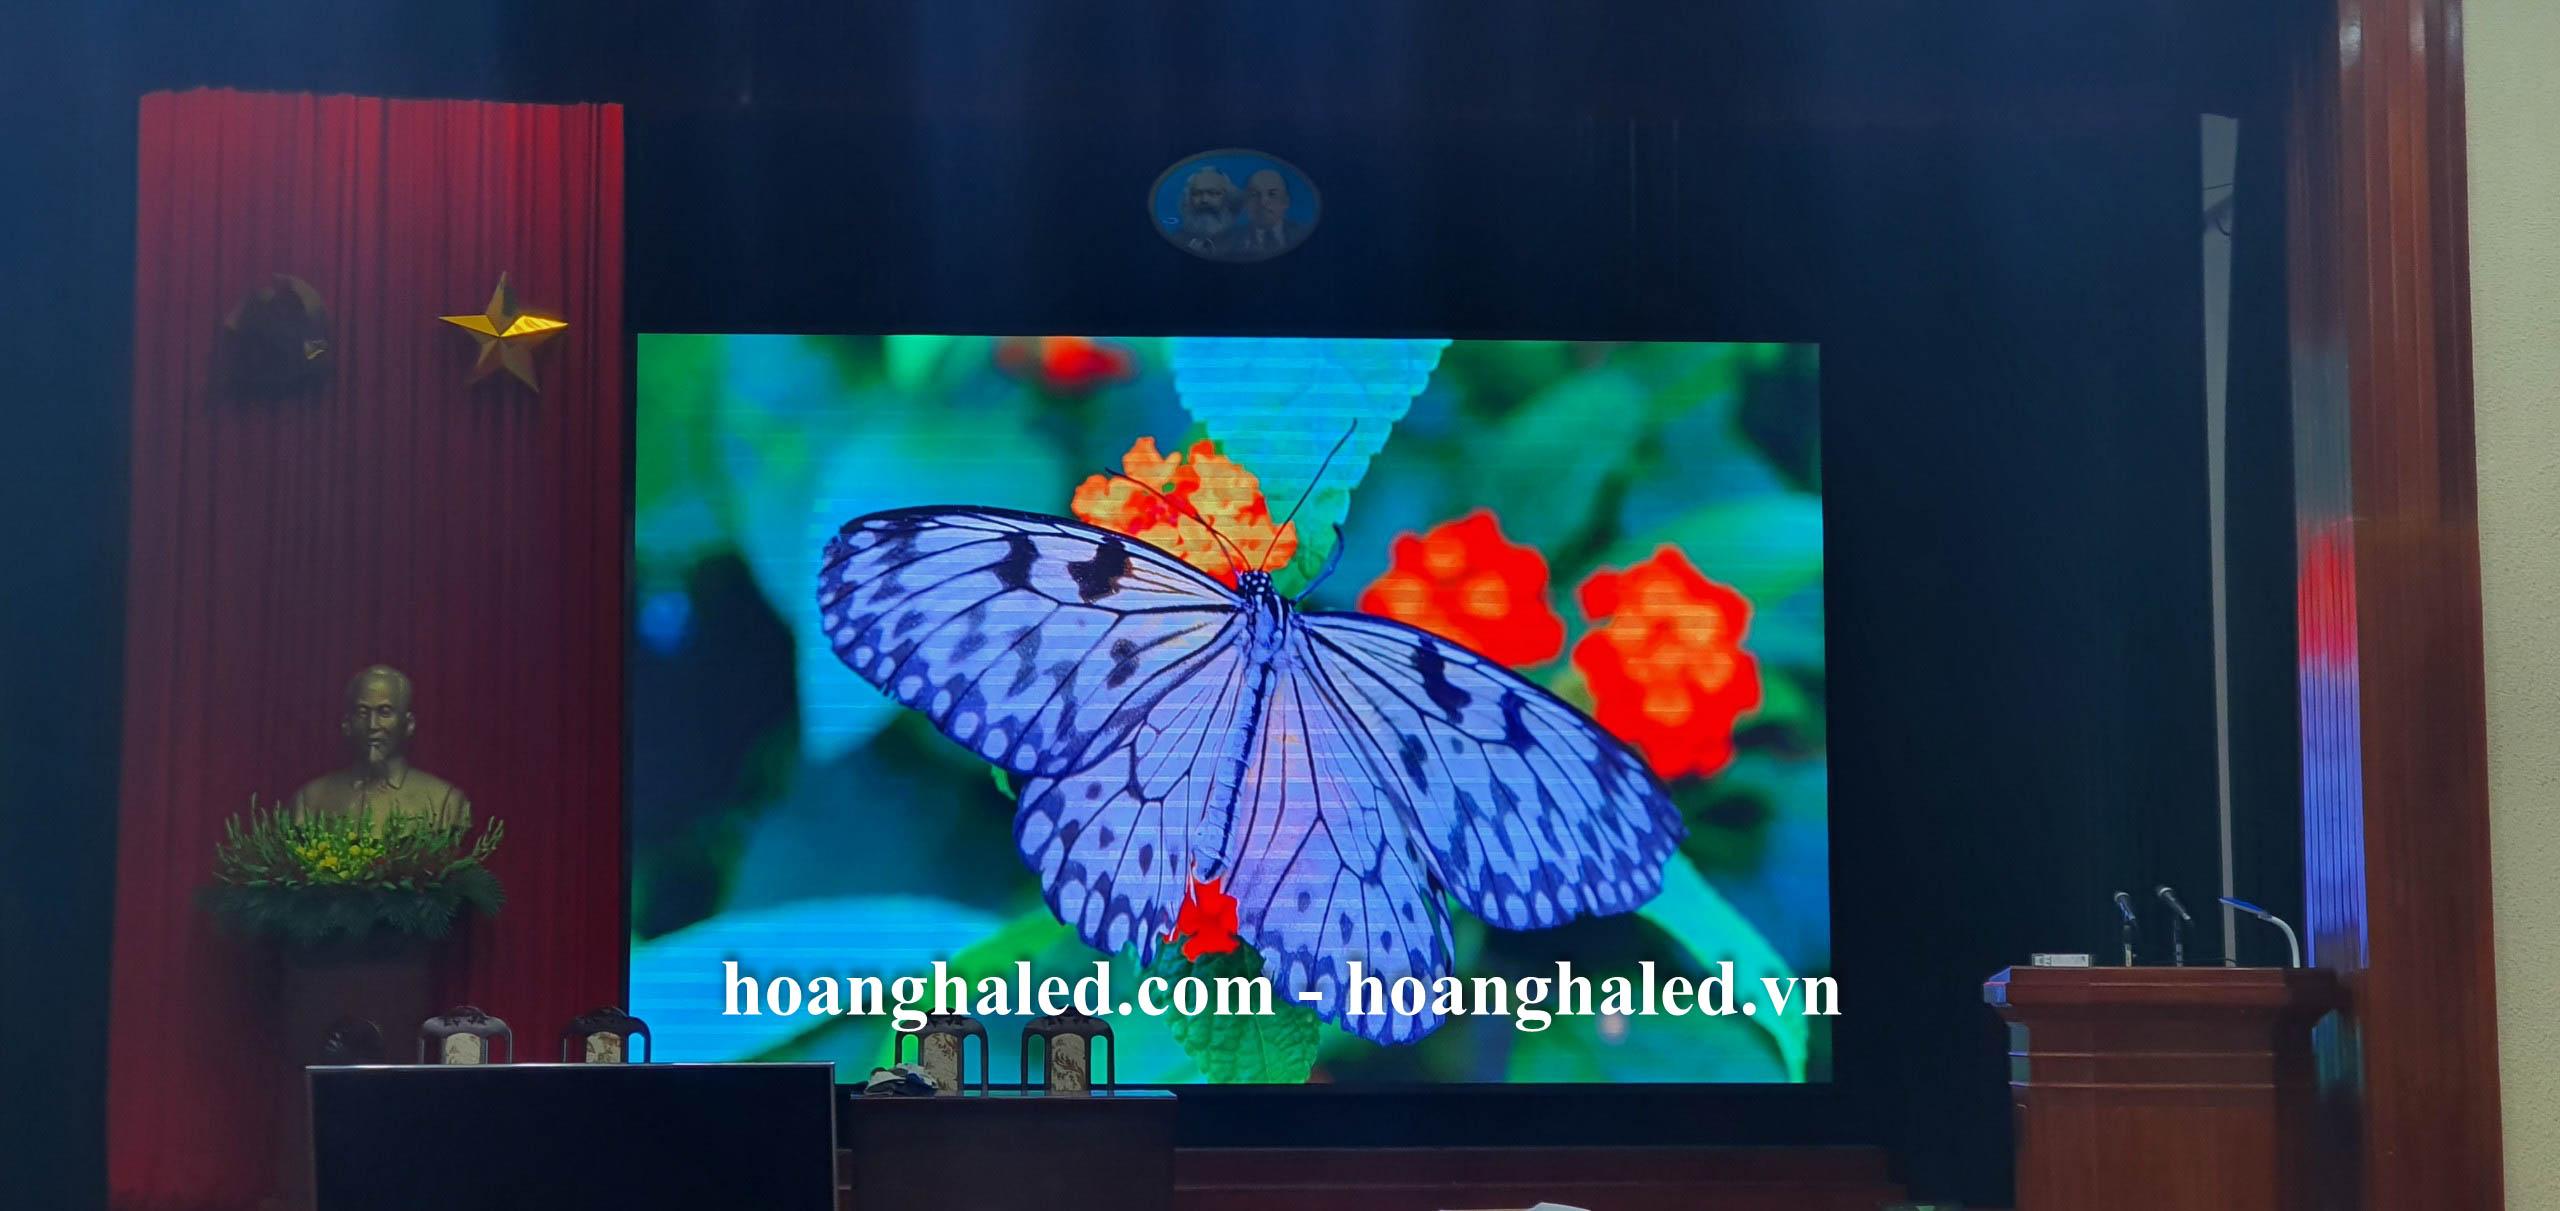 man_hinh_led_p3_trong_nha_tai_hoc_vien_chinh_tri_khu_vuc_i_7